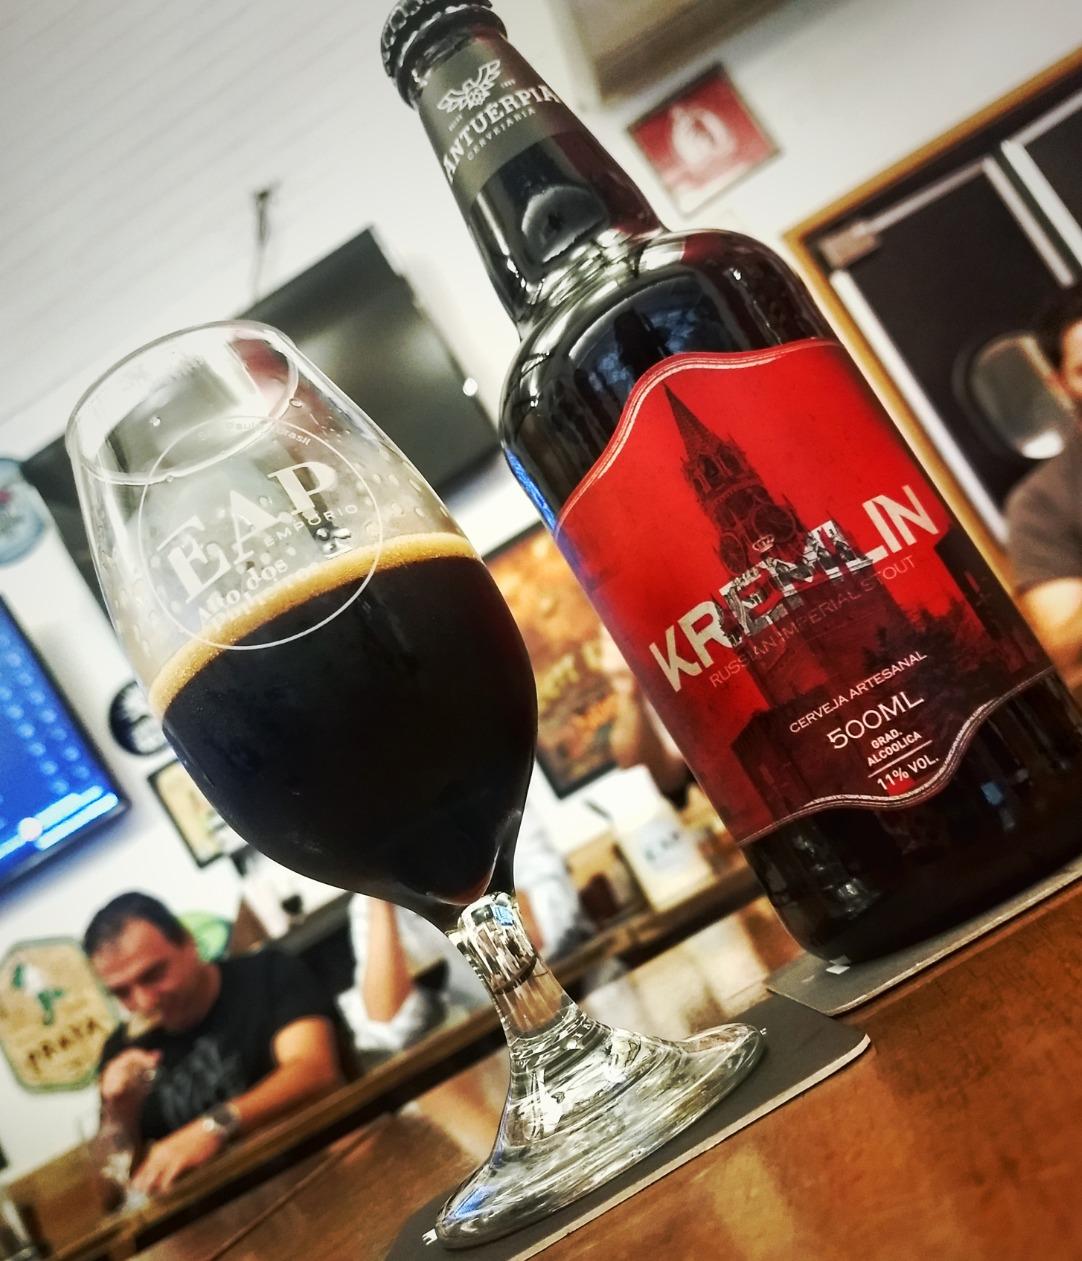 Kremilin - Cervejaria Antuérpia